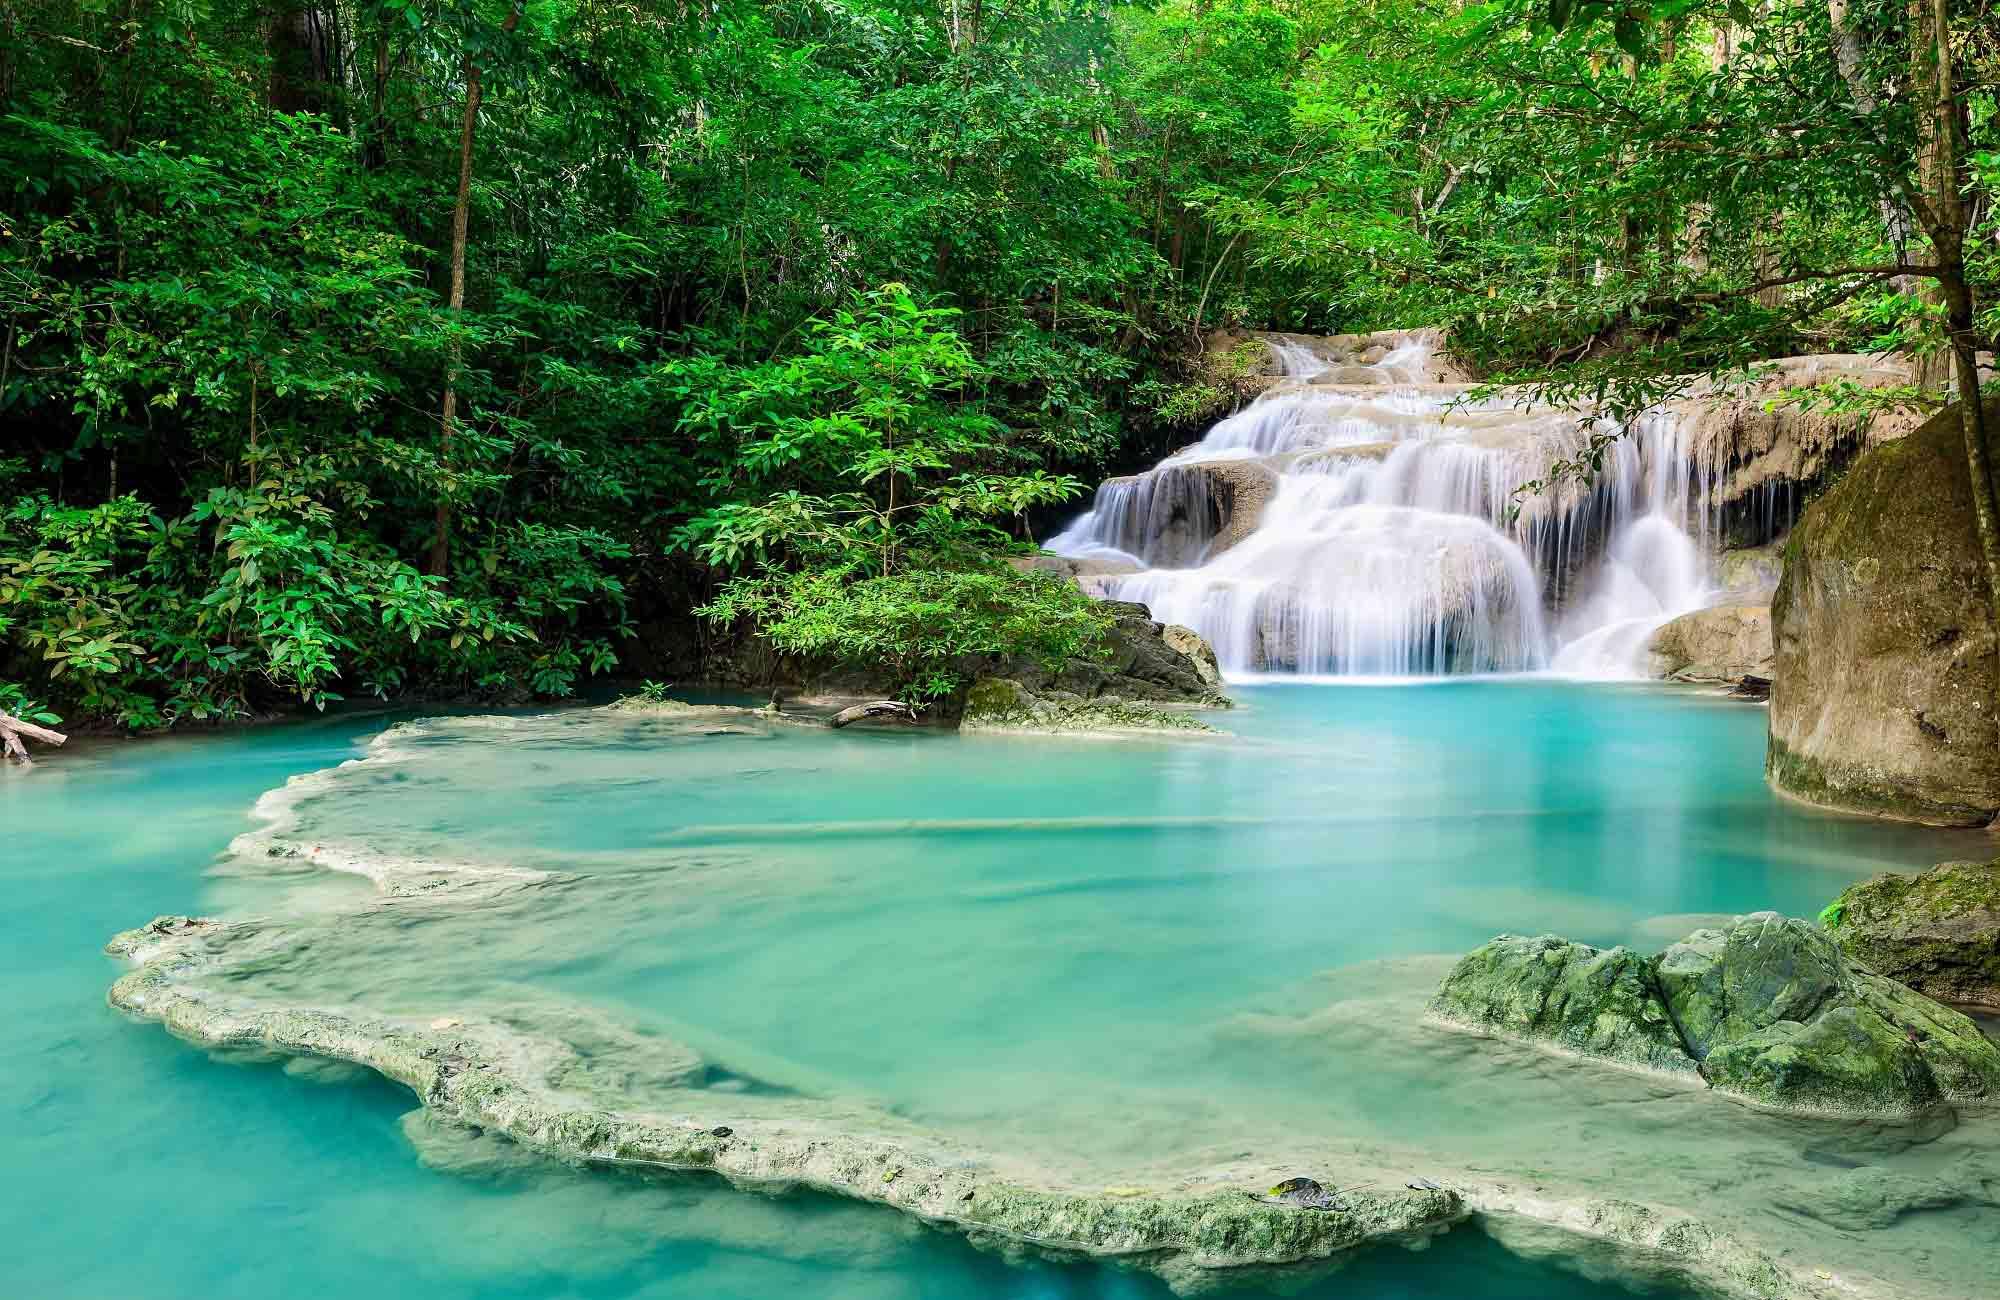 Voyage Thaïlande - Parc Erawan Cascades - Amplitudes